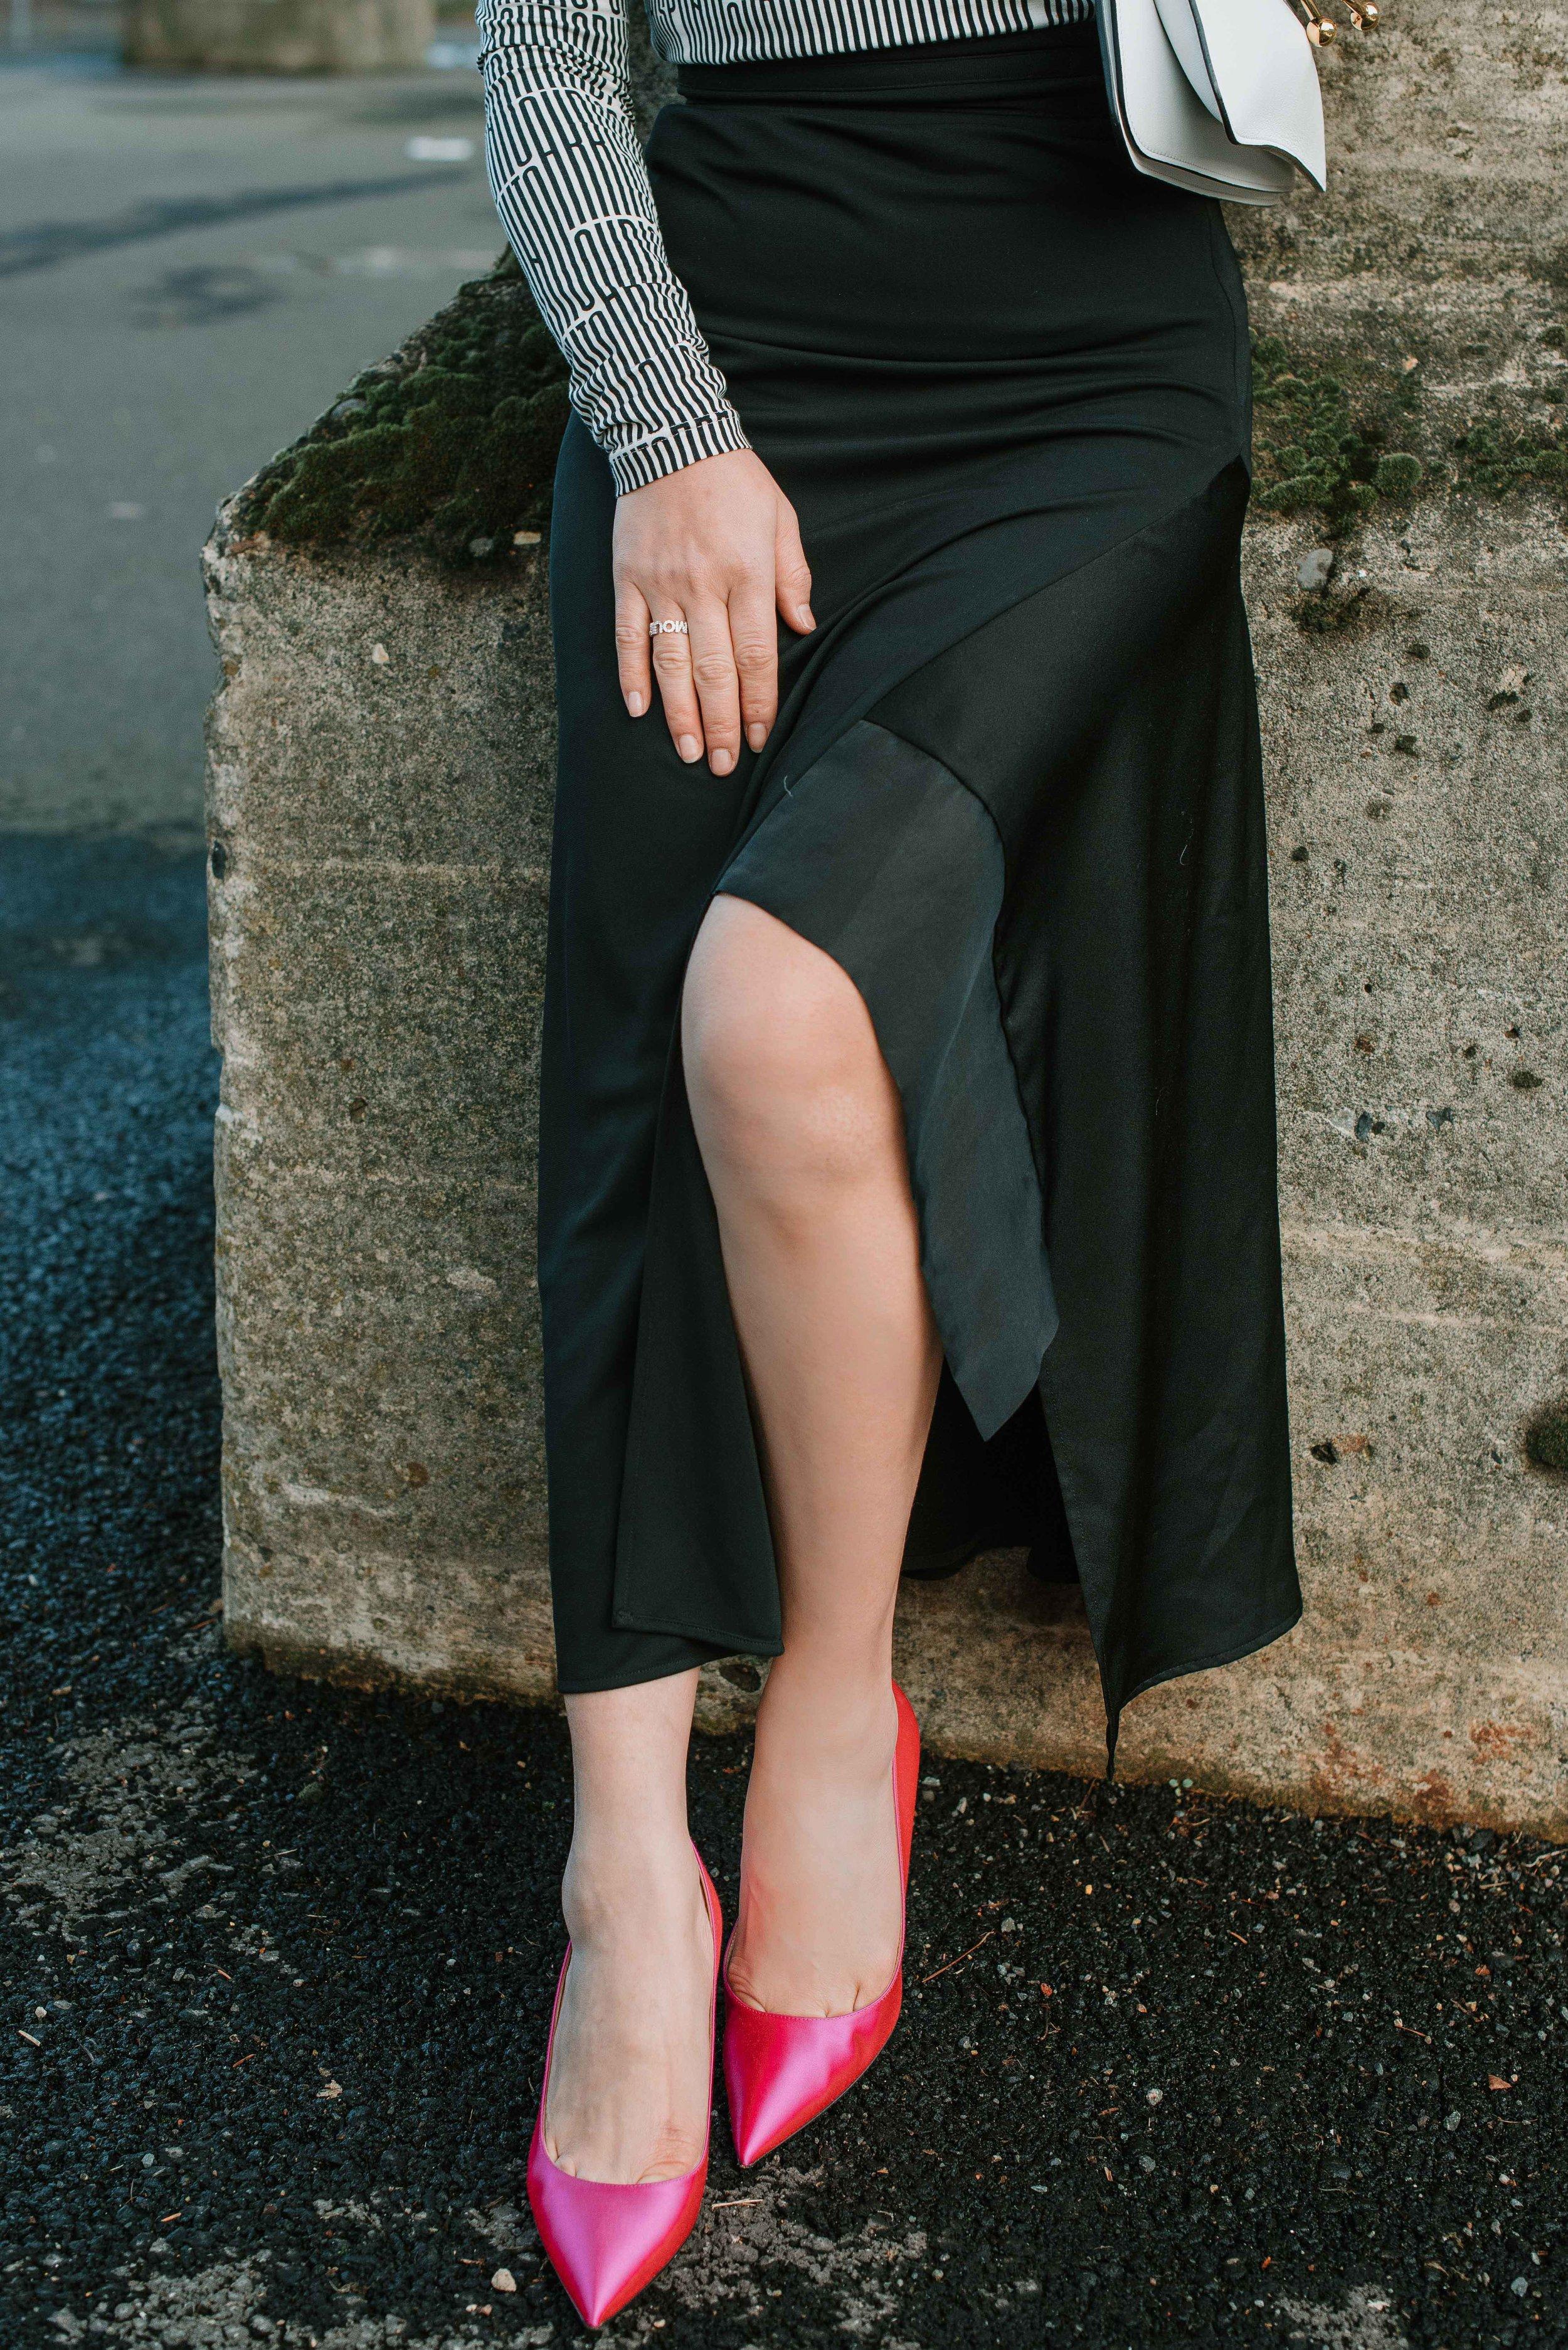 Akris-punto-turtle-neck-and-pink-shoe-7794.jpg